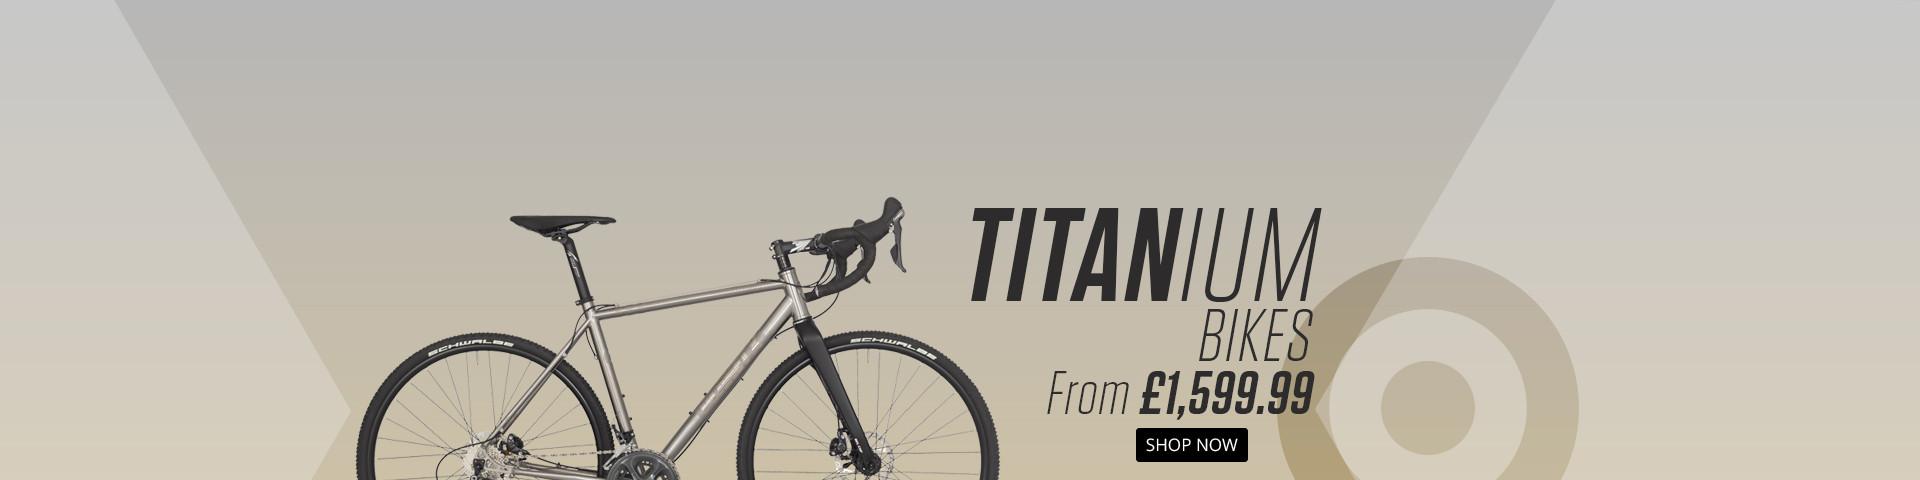 New Titanium Bikes